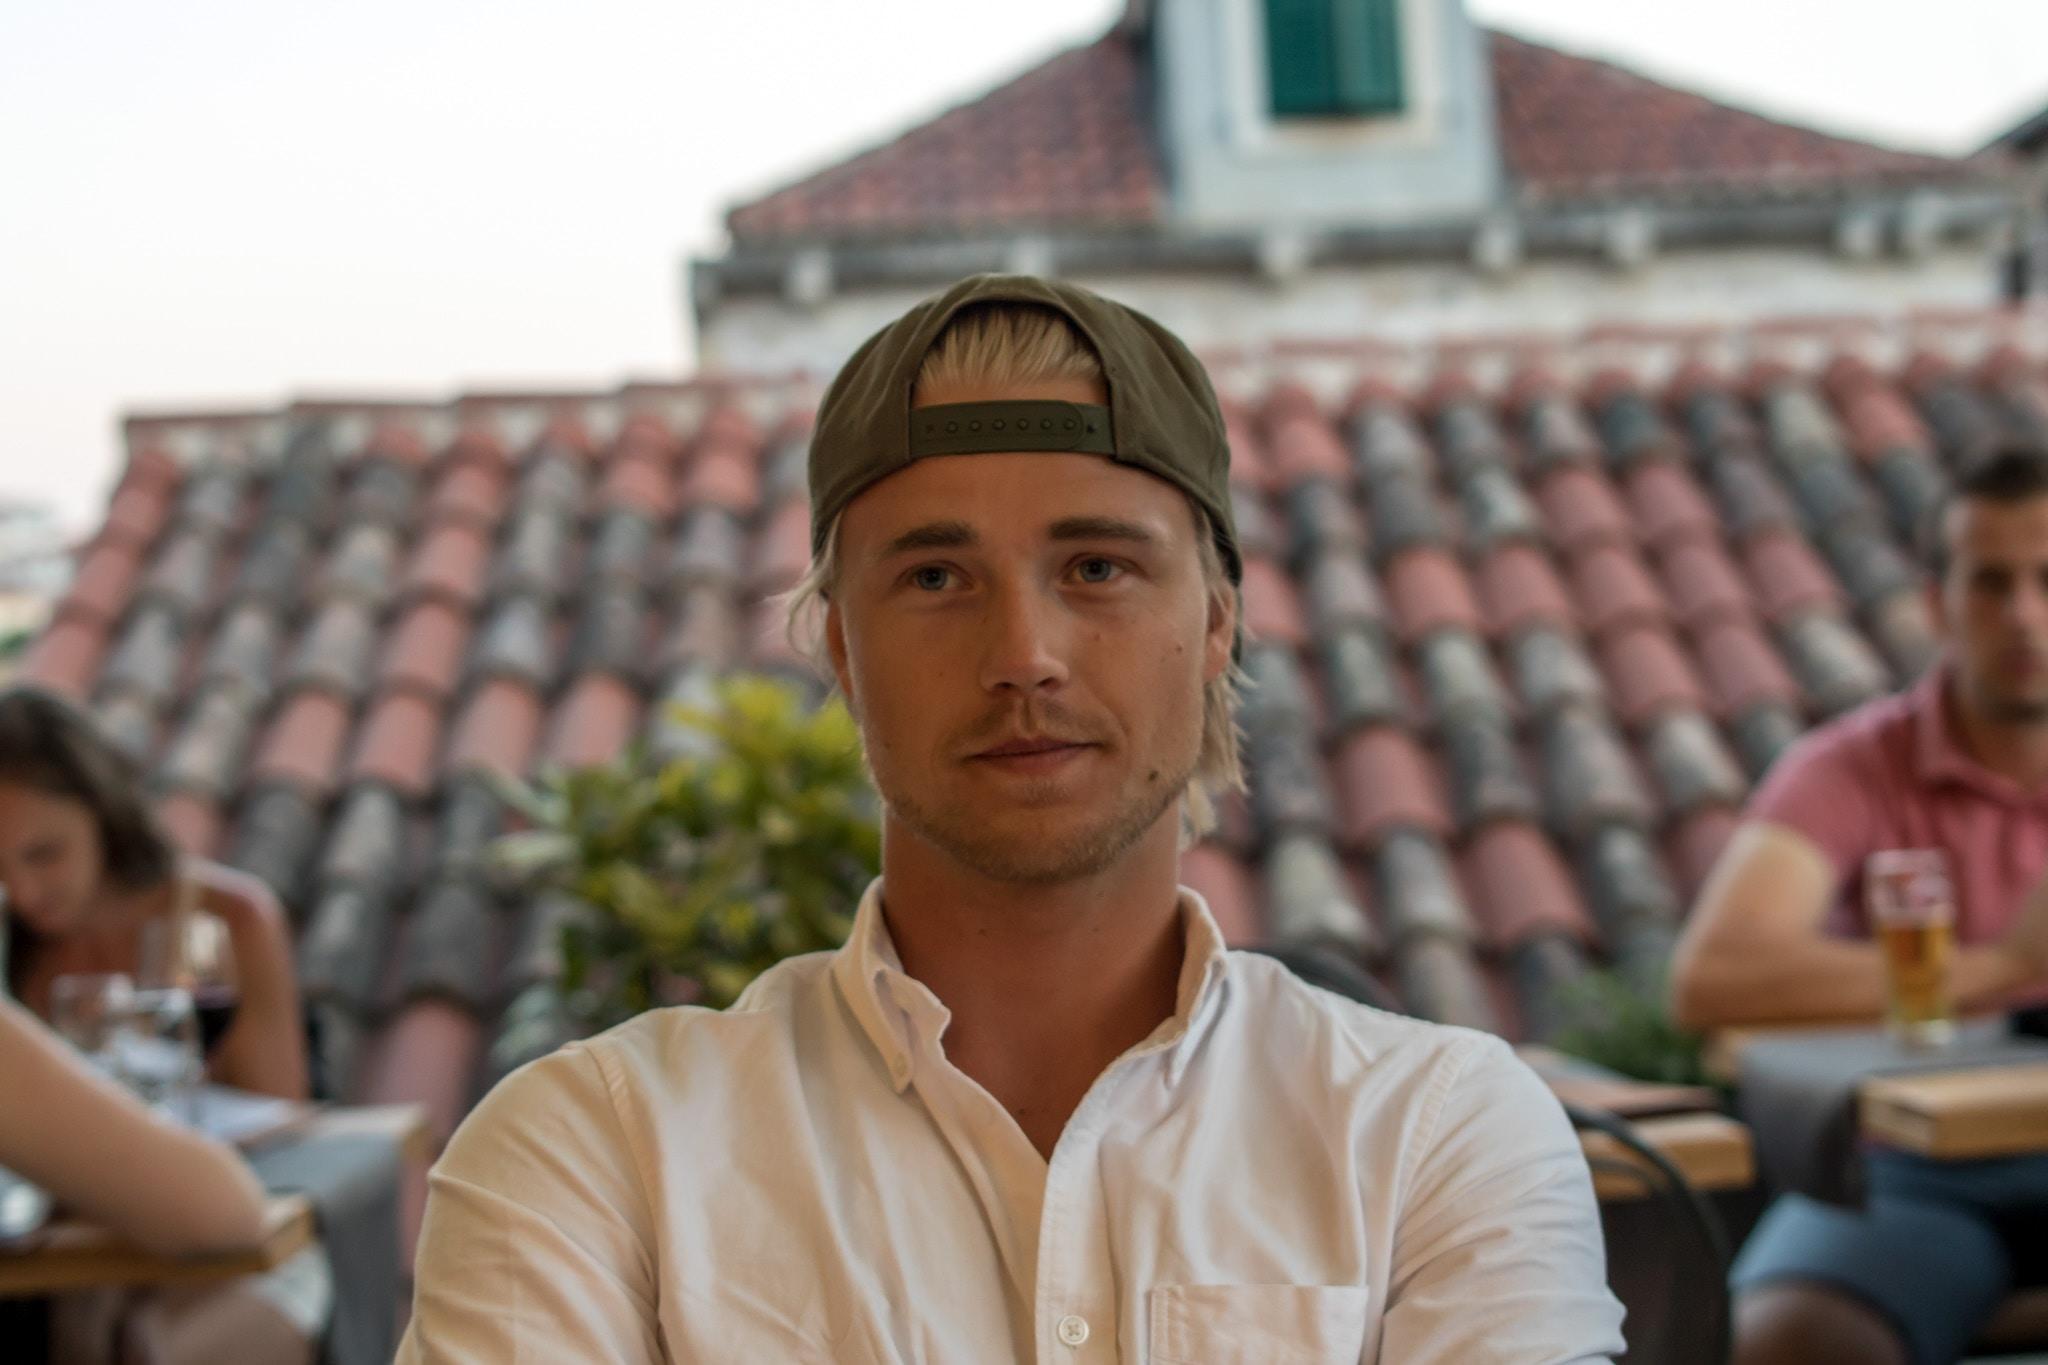 Go to Marcus Löfvenberg's profile